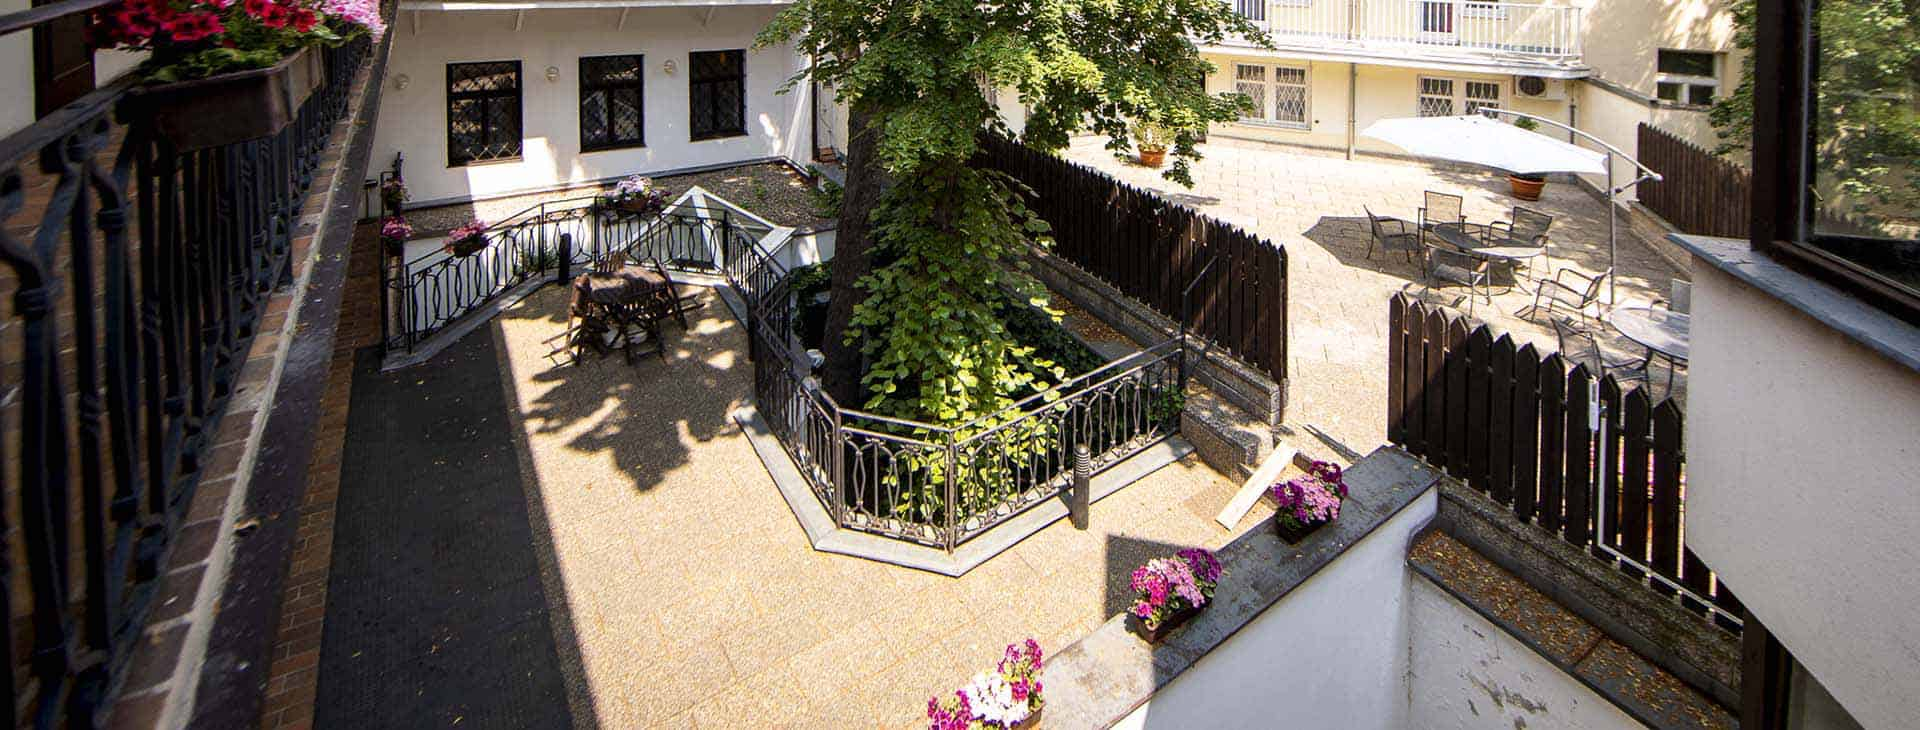 amadeus-hotel-prague-terrace-1920×730-2